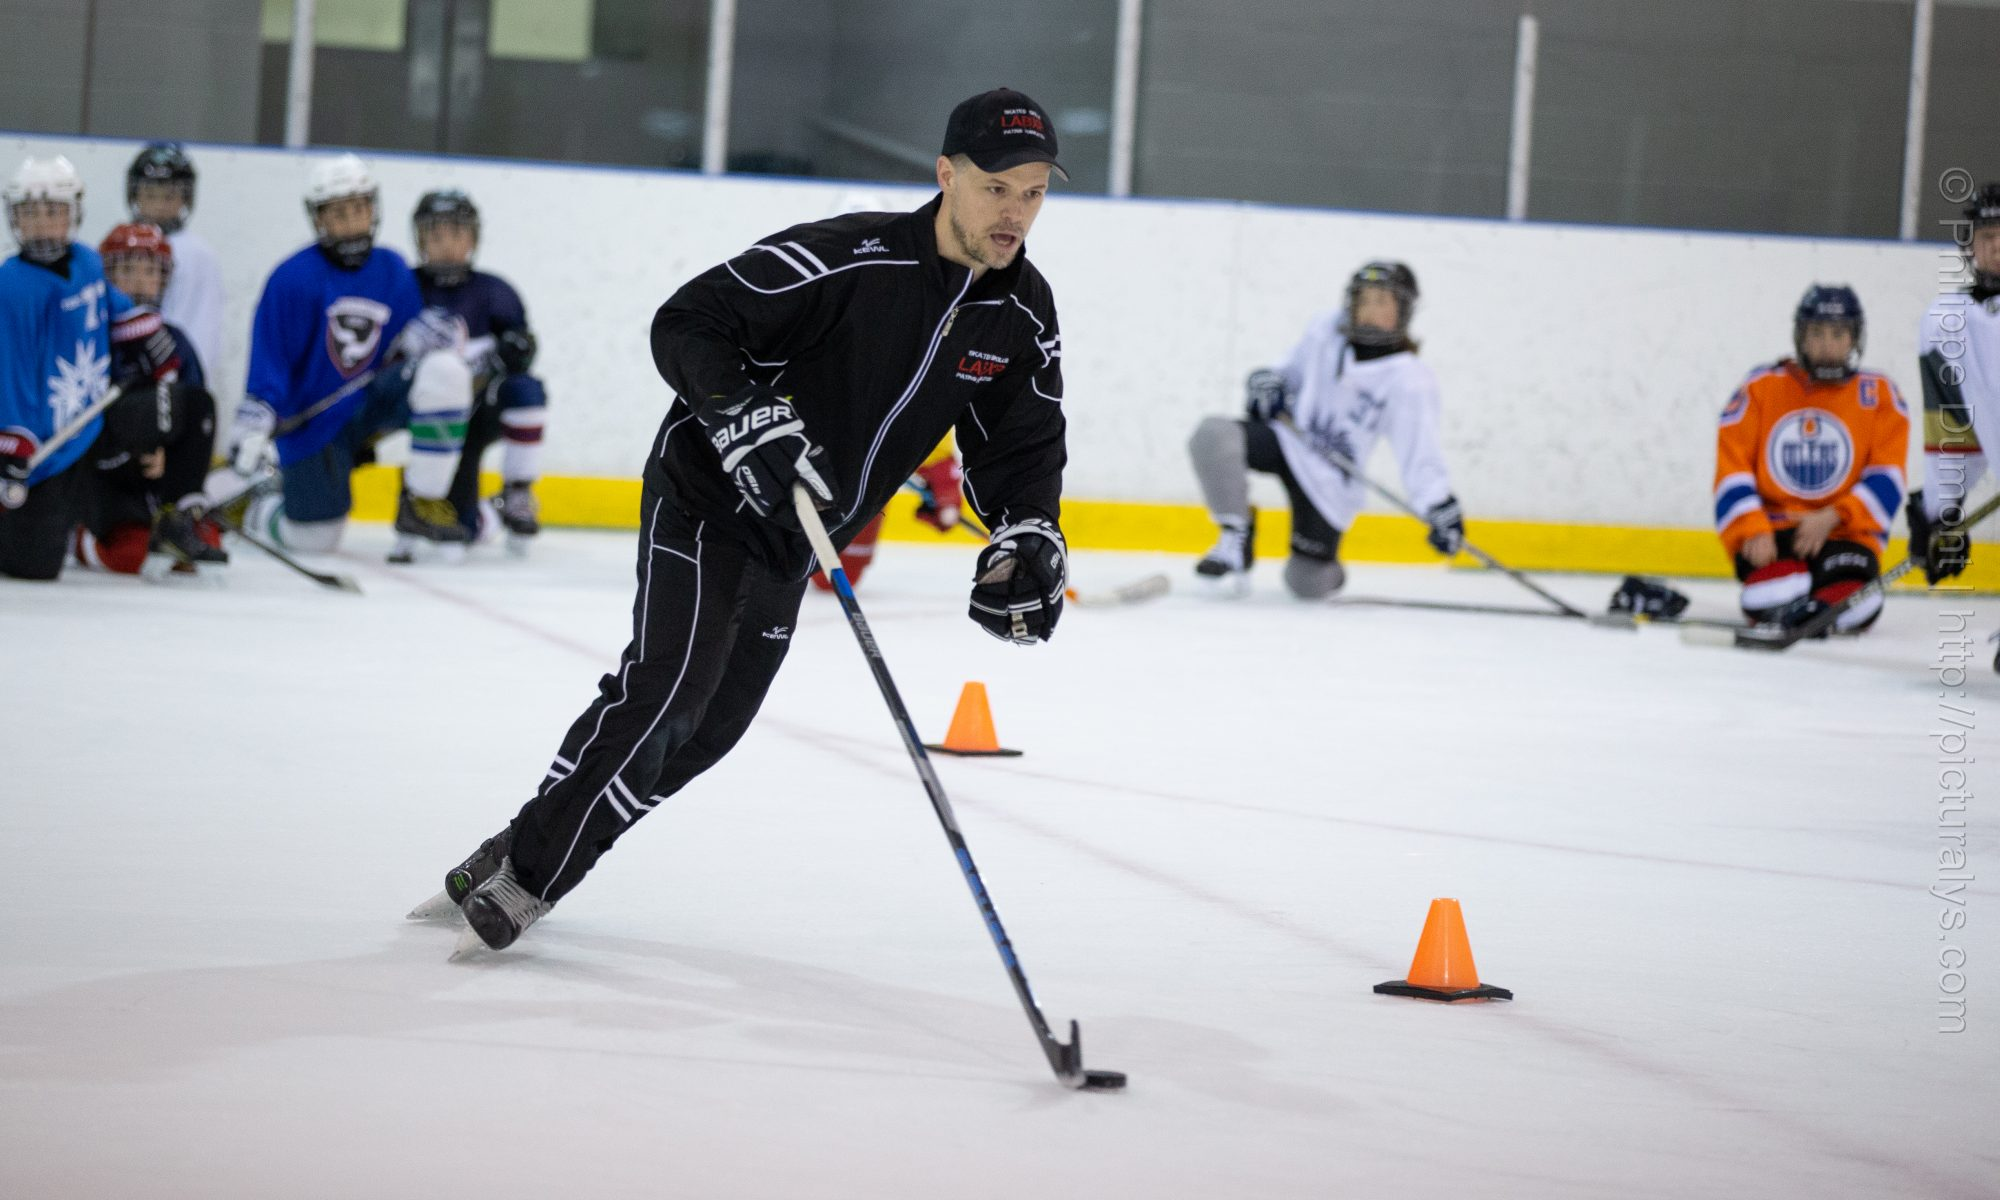 LABxp Hockey